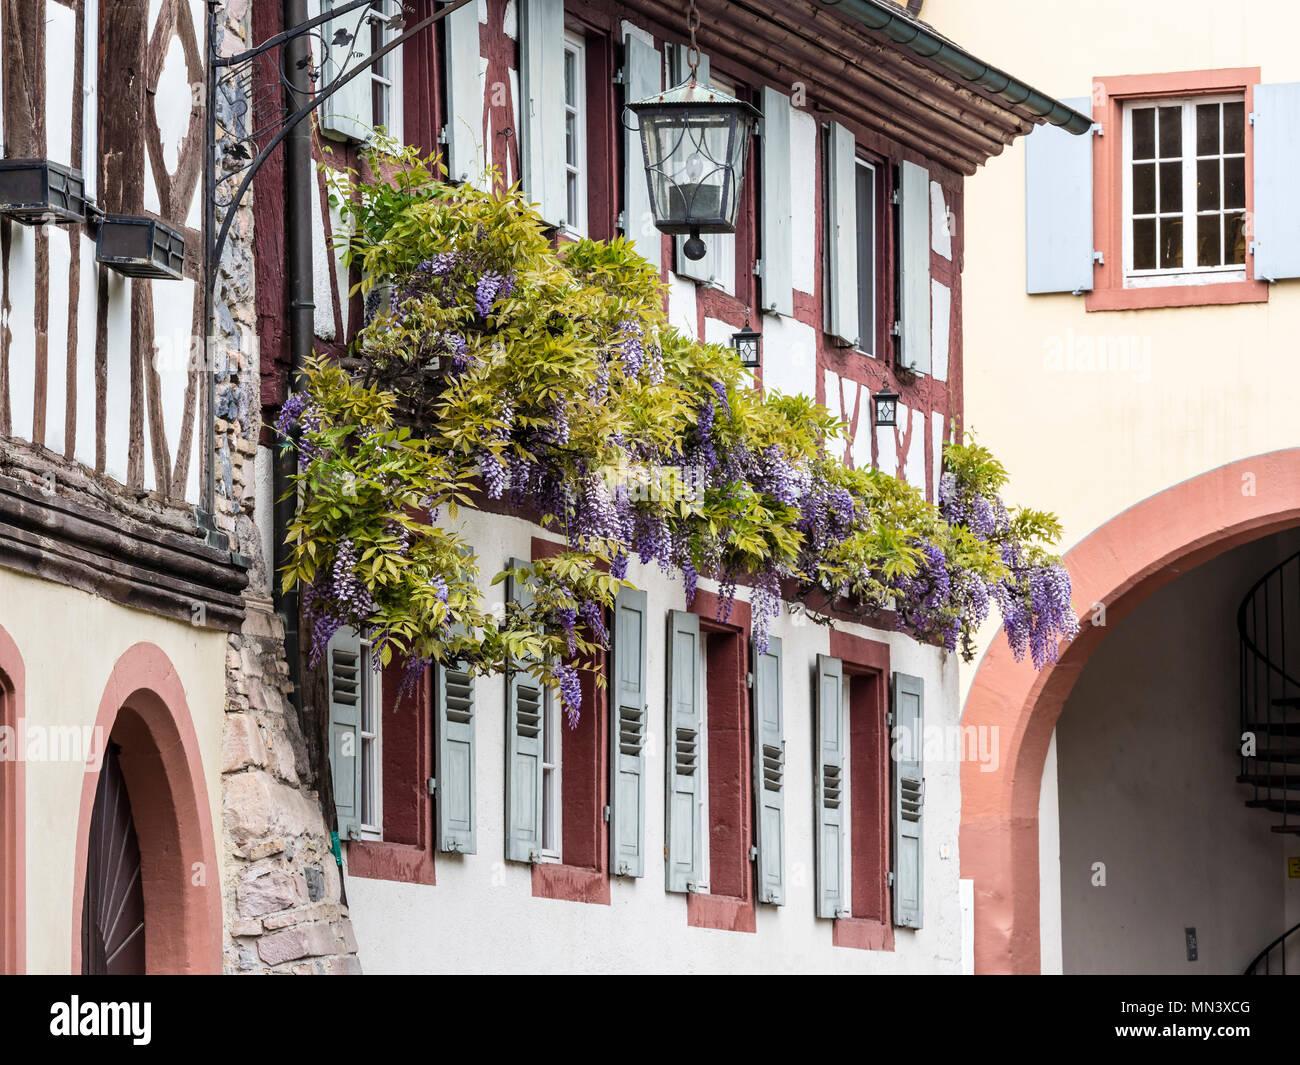 Village Burkheim near Freiburg, Breisgau, Baden-Würtemberg, Germany Stock Photo